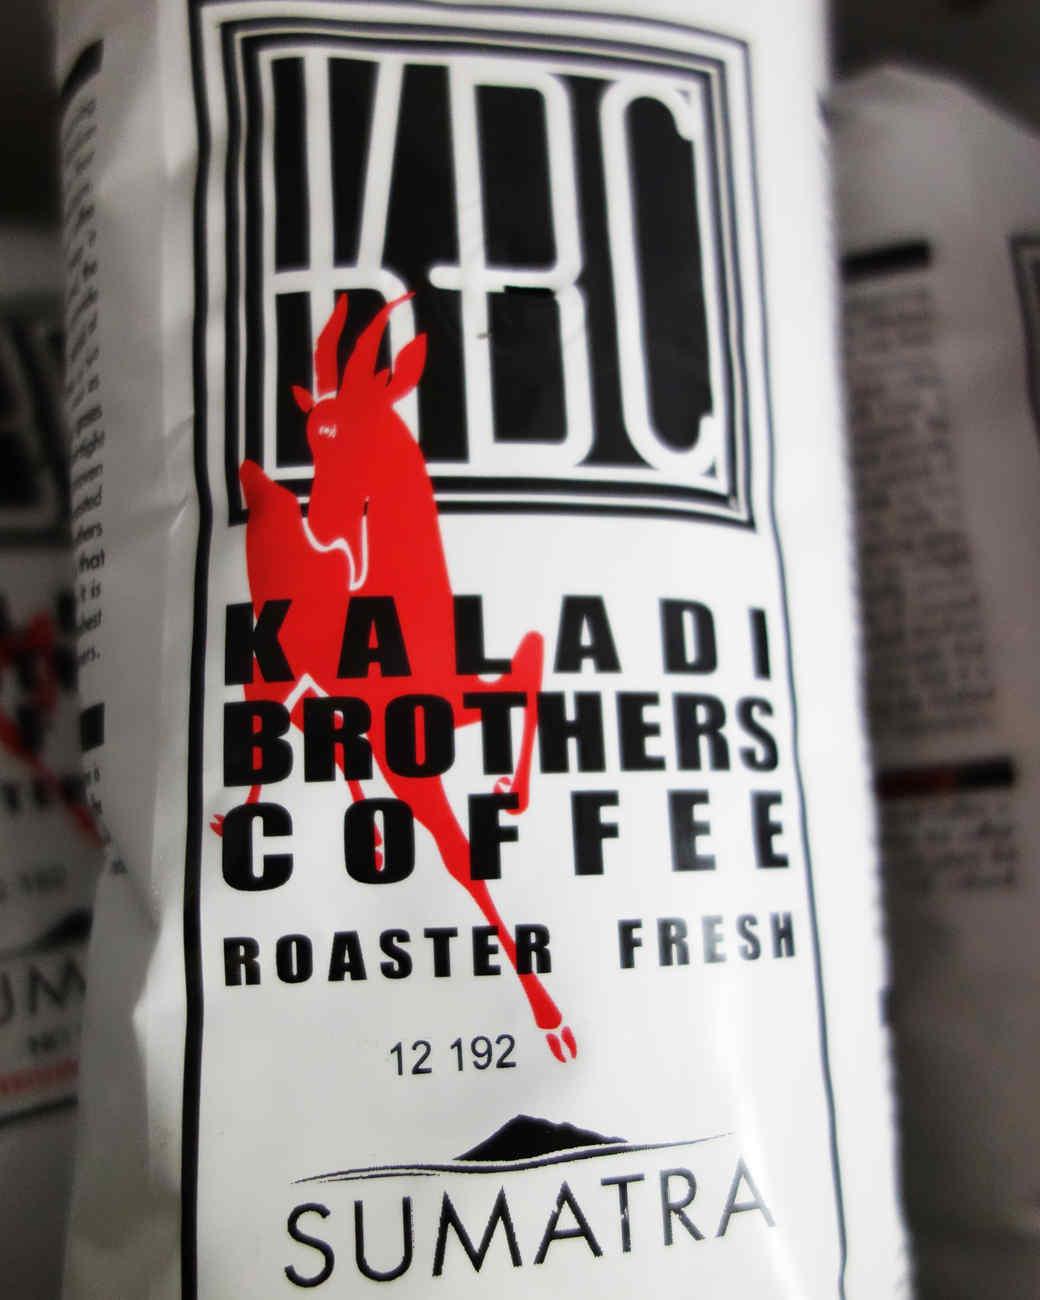 kaladi-brothers-coffee-00200-mld109417.jpg